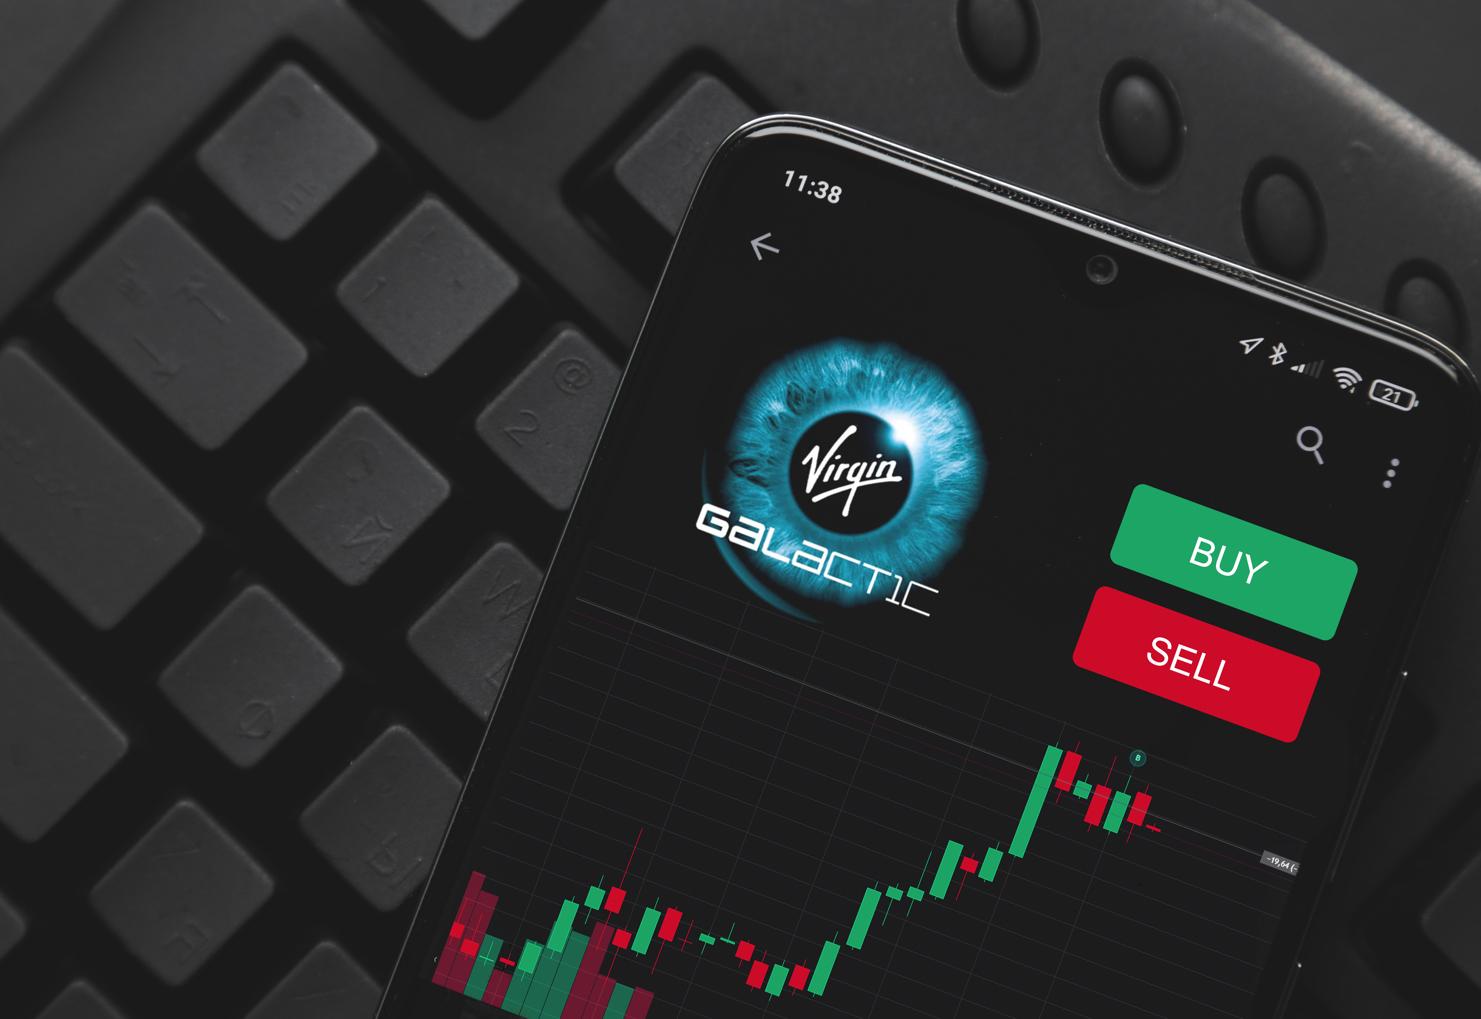 Virgin Galactic stock, SPCE stock news and analysis